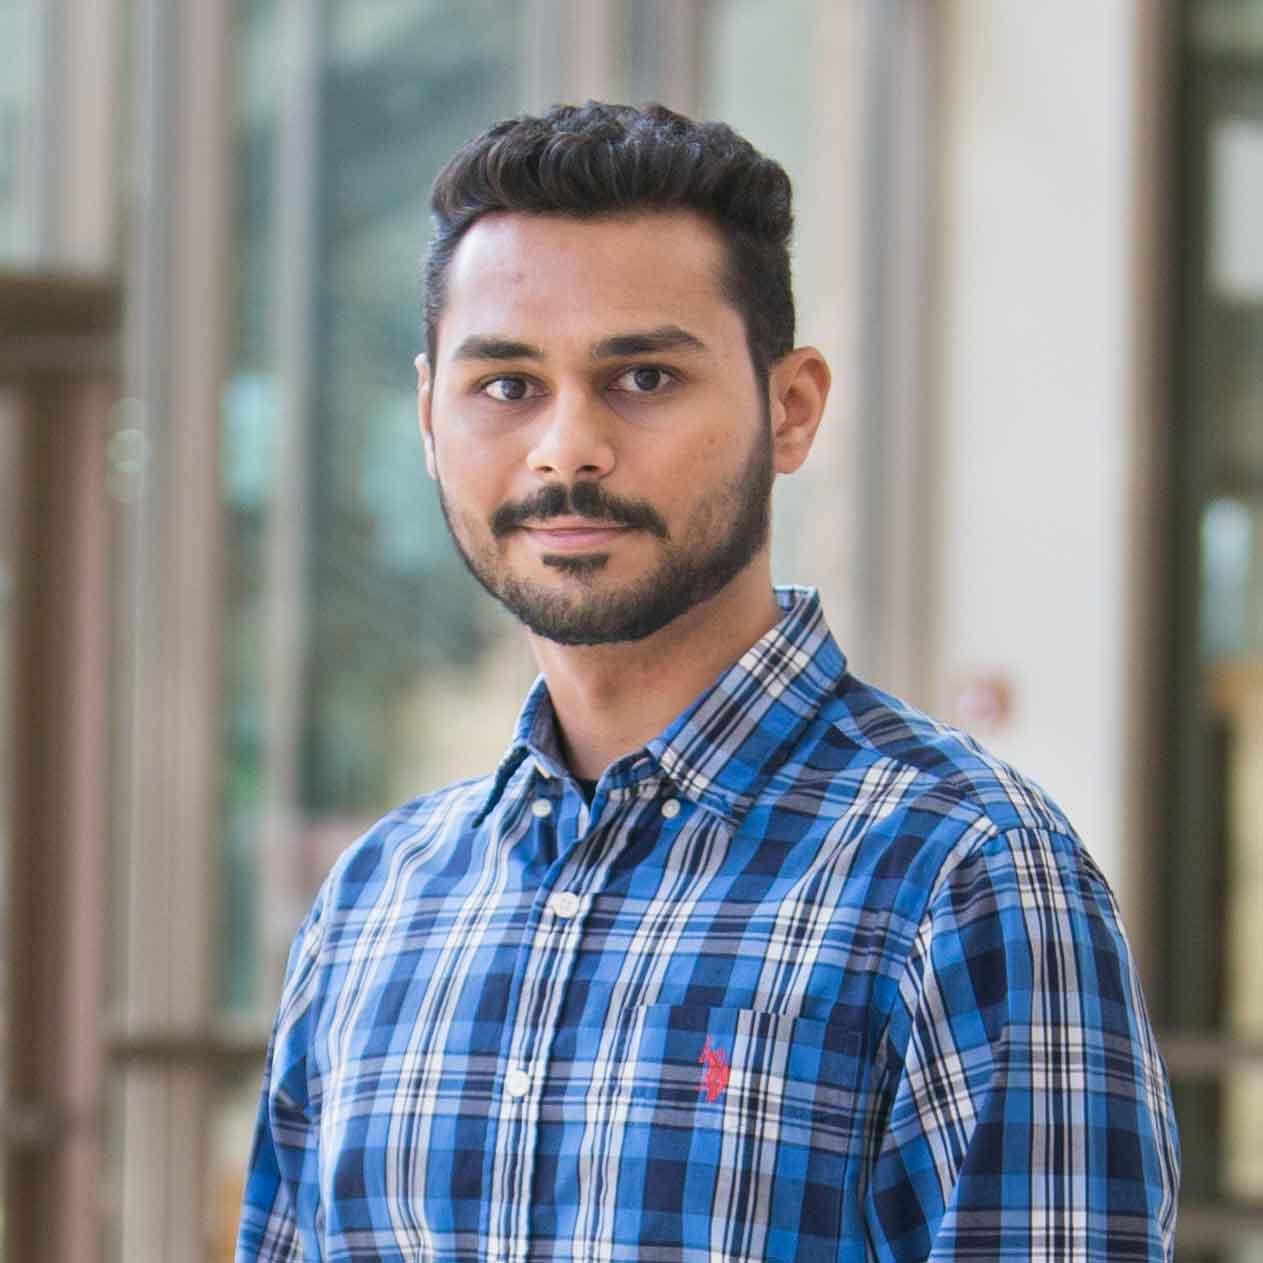 Jaykumar Patel